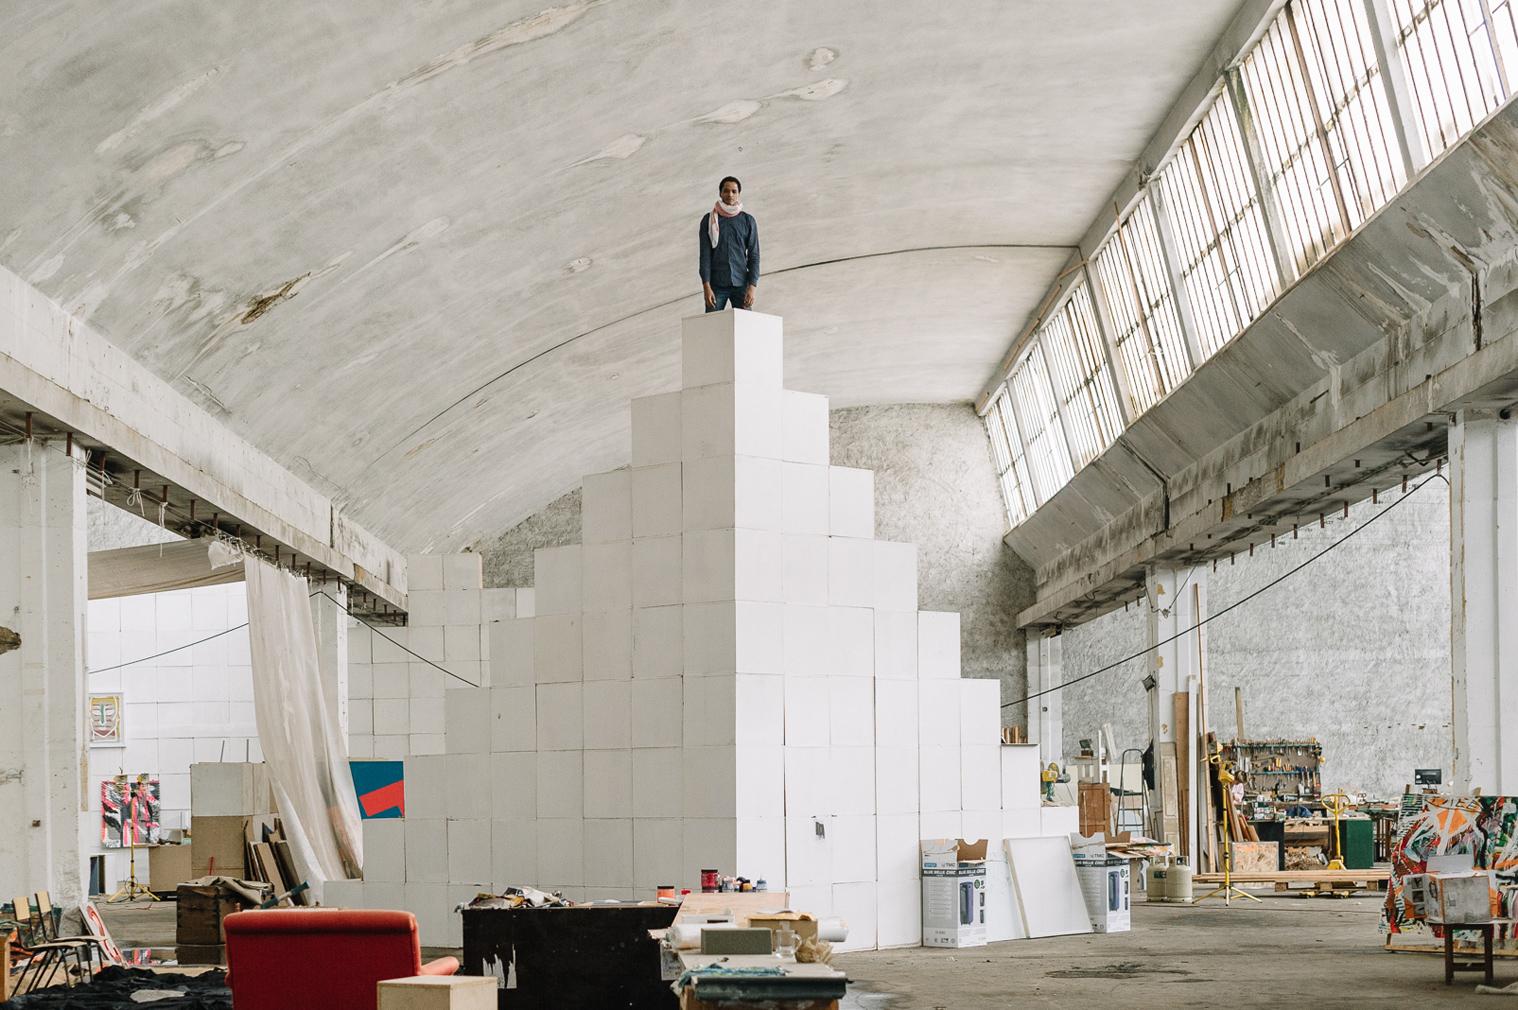 Francisco-Vidall,-How-I-work.-Pyramid-tower.-The-Spaces.-Photography-Rodrigo-Cardoso